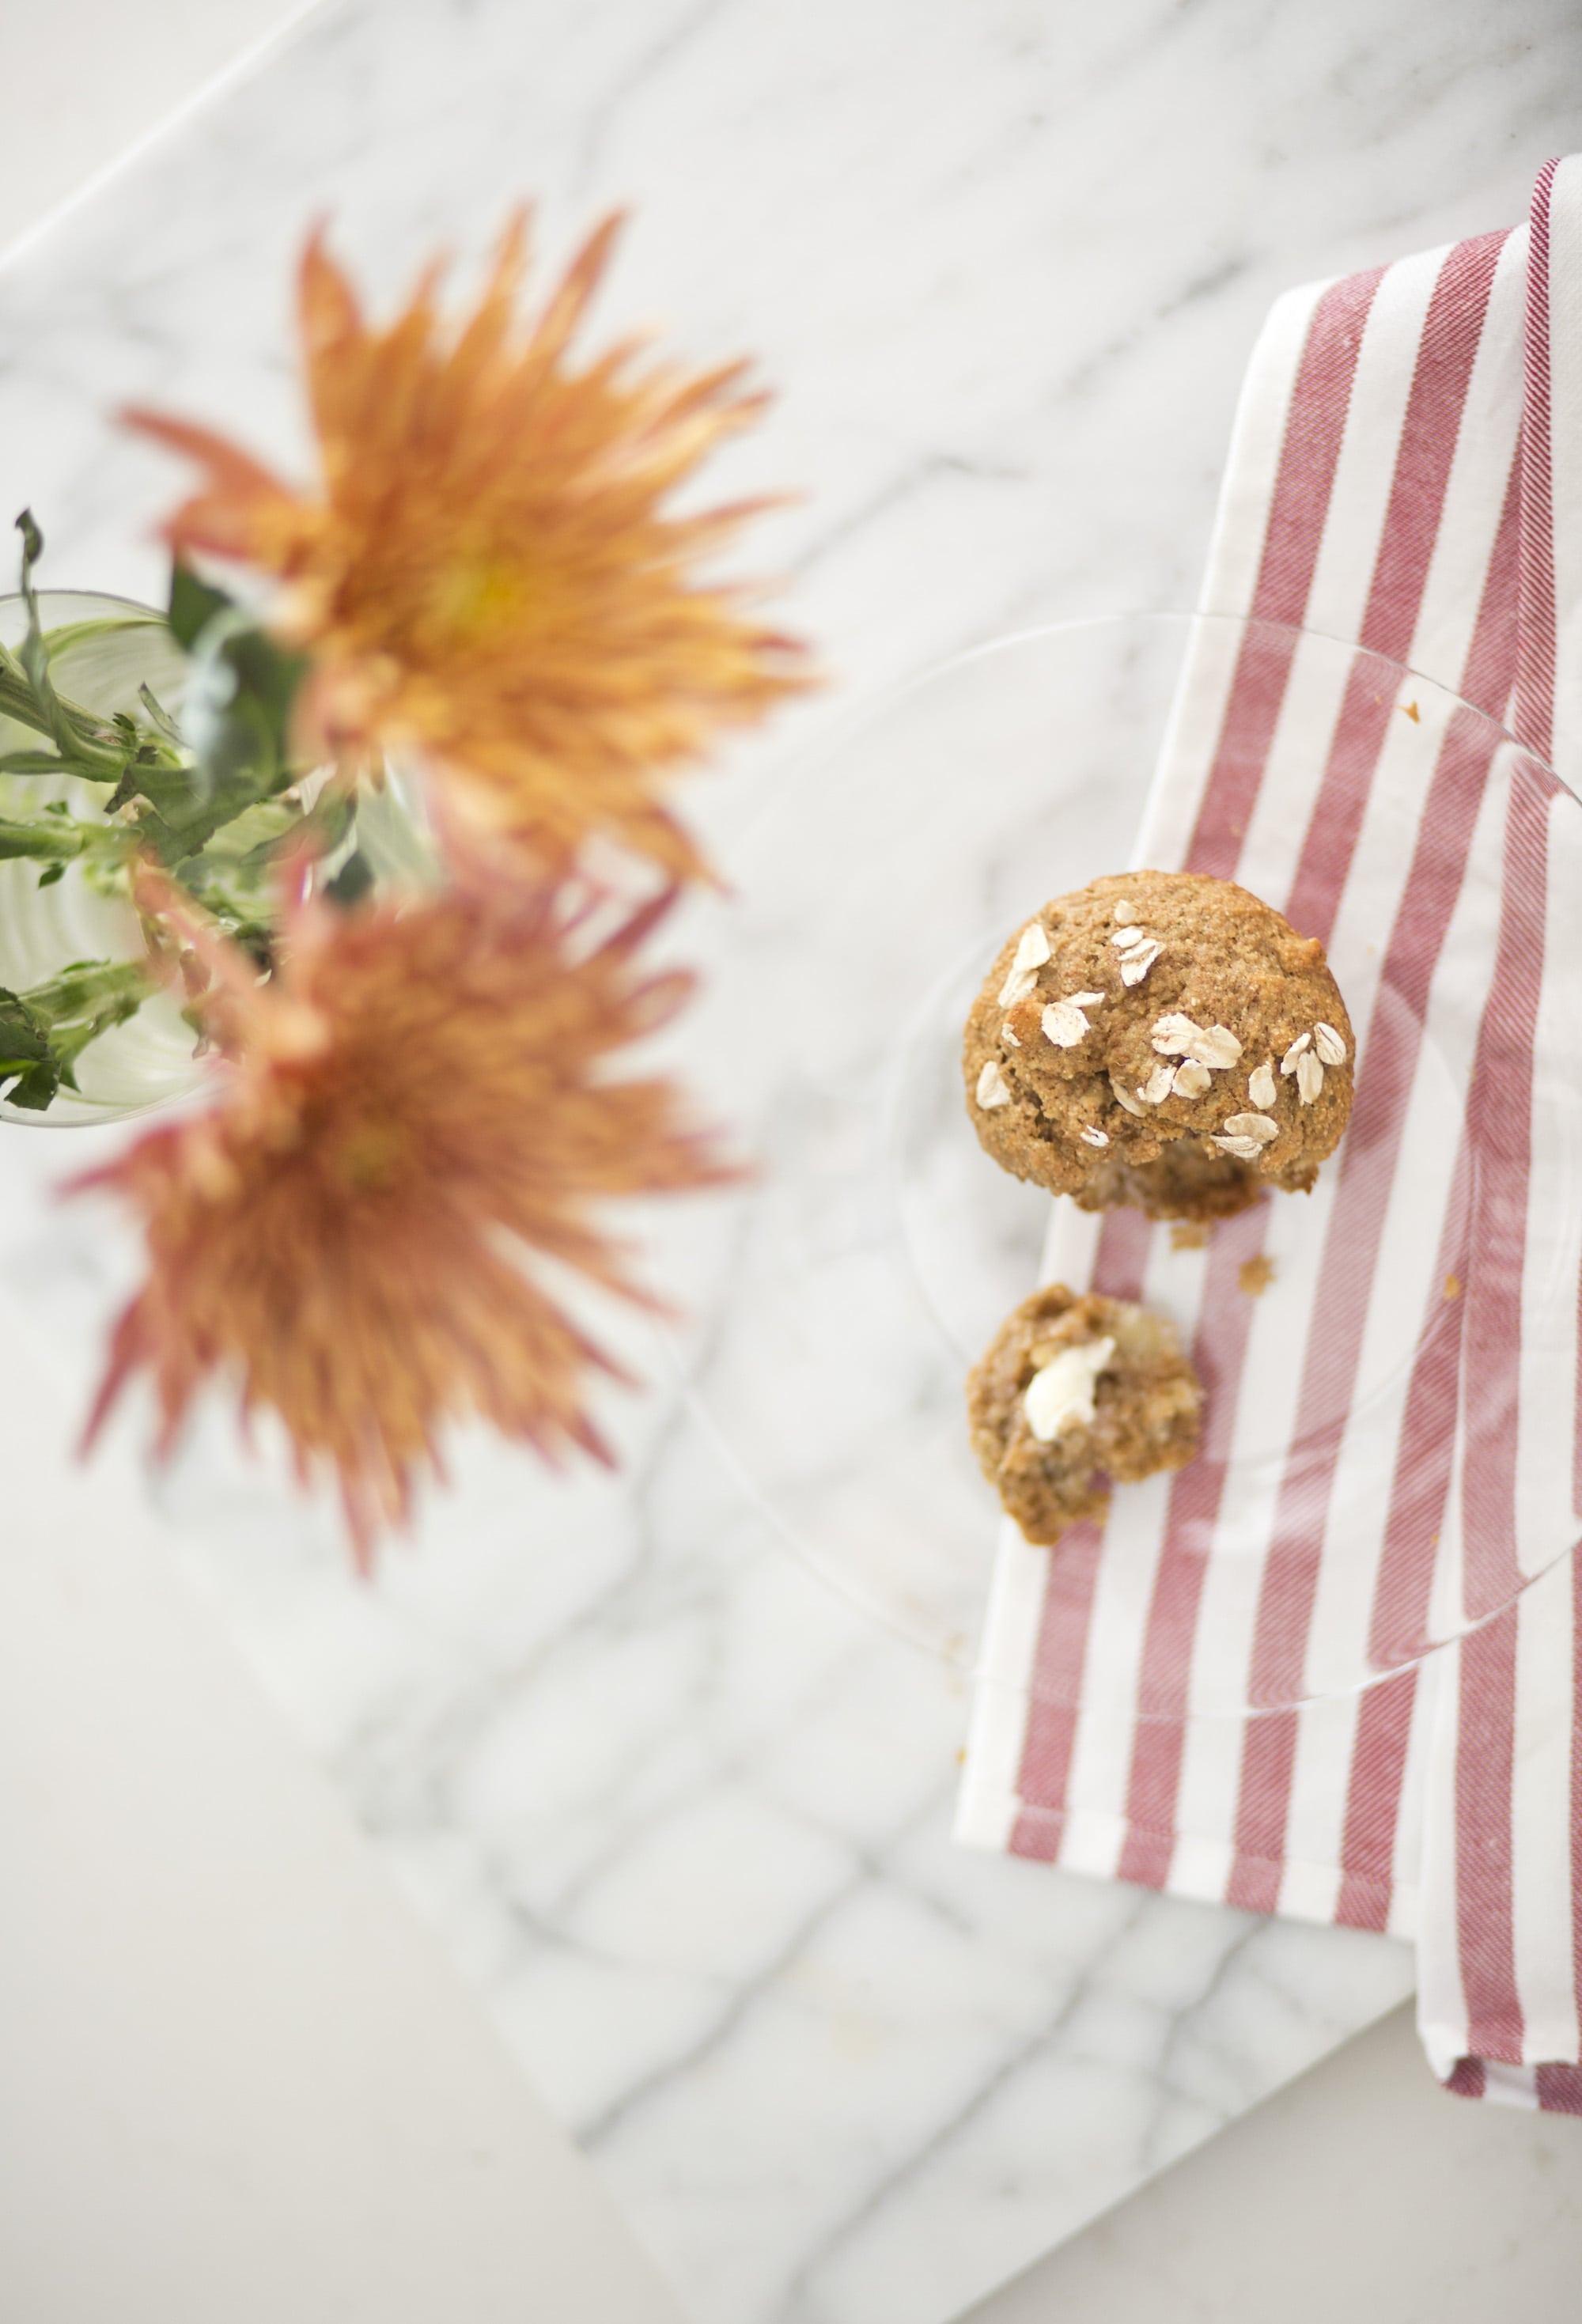 A Dash of Details bakes banana muffins